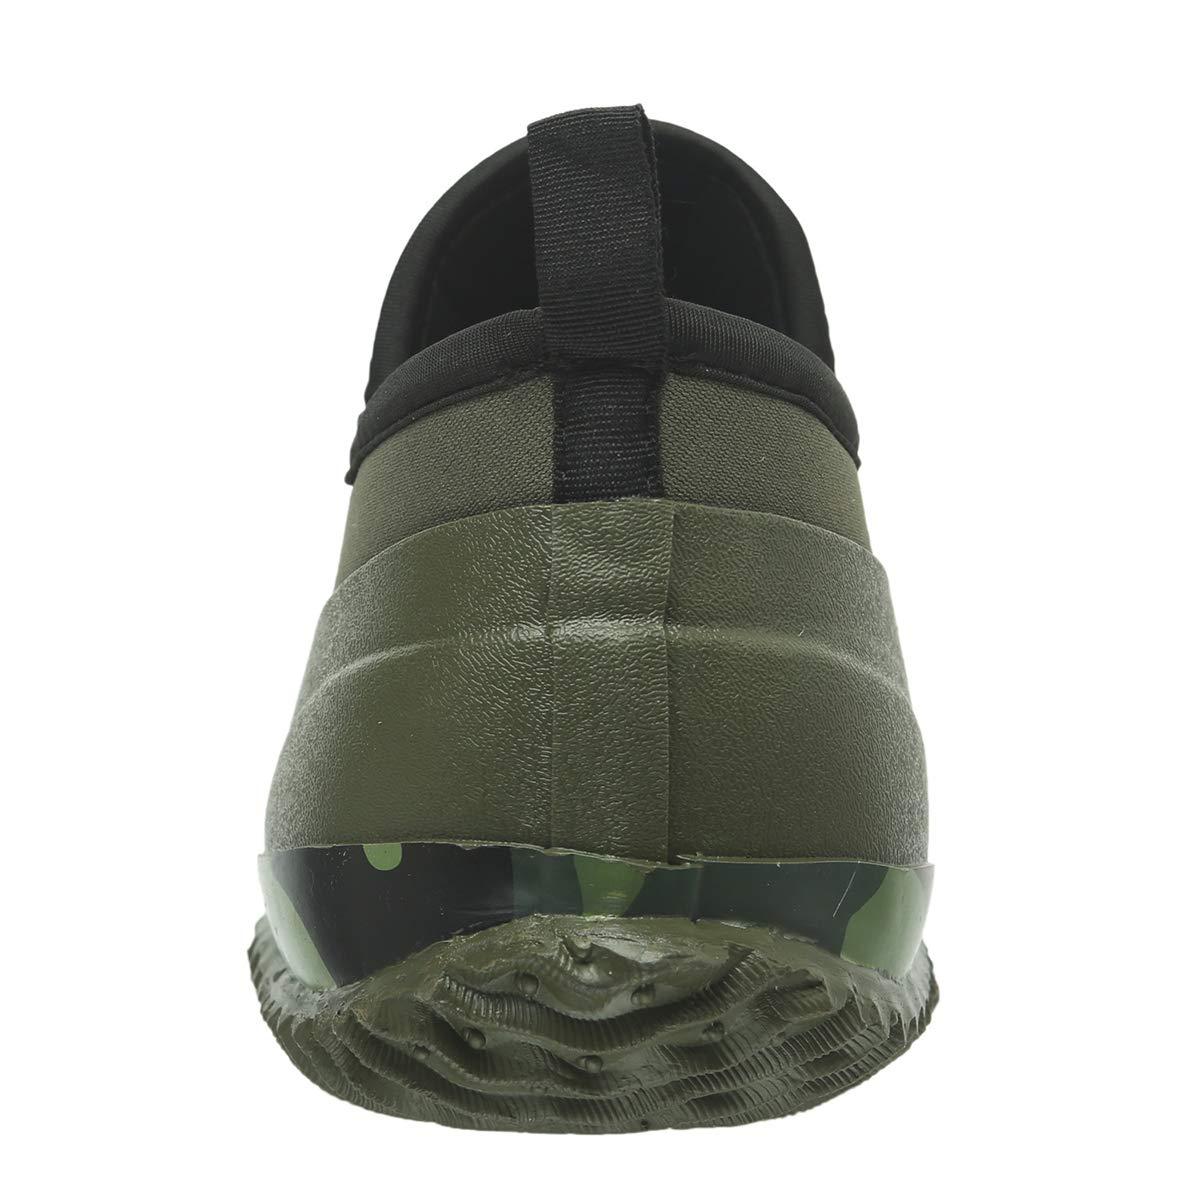 JOINFREE Botas De Lluvia para Mujer Botas Cortas Cortas Calzado para Tobillo Calzado Al Aire Libre